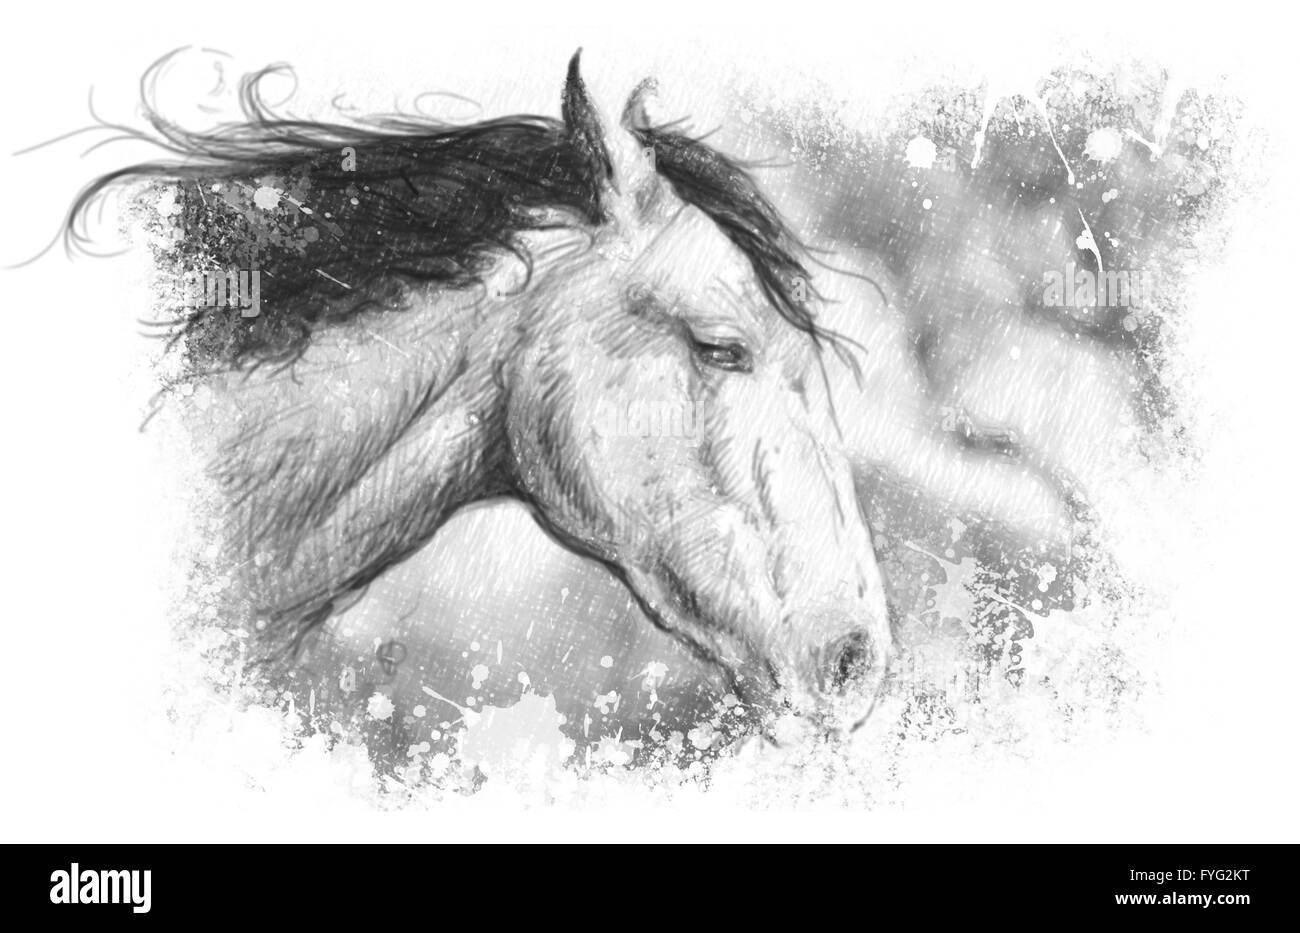 Horse illustration, tattoo art, sketch - Stock Image